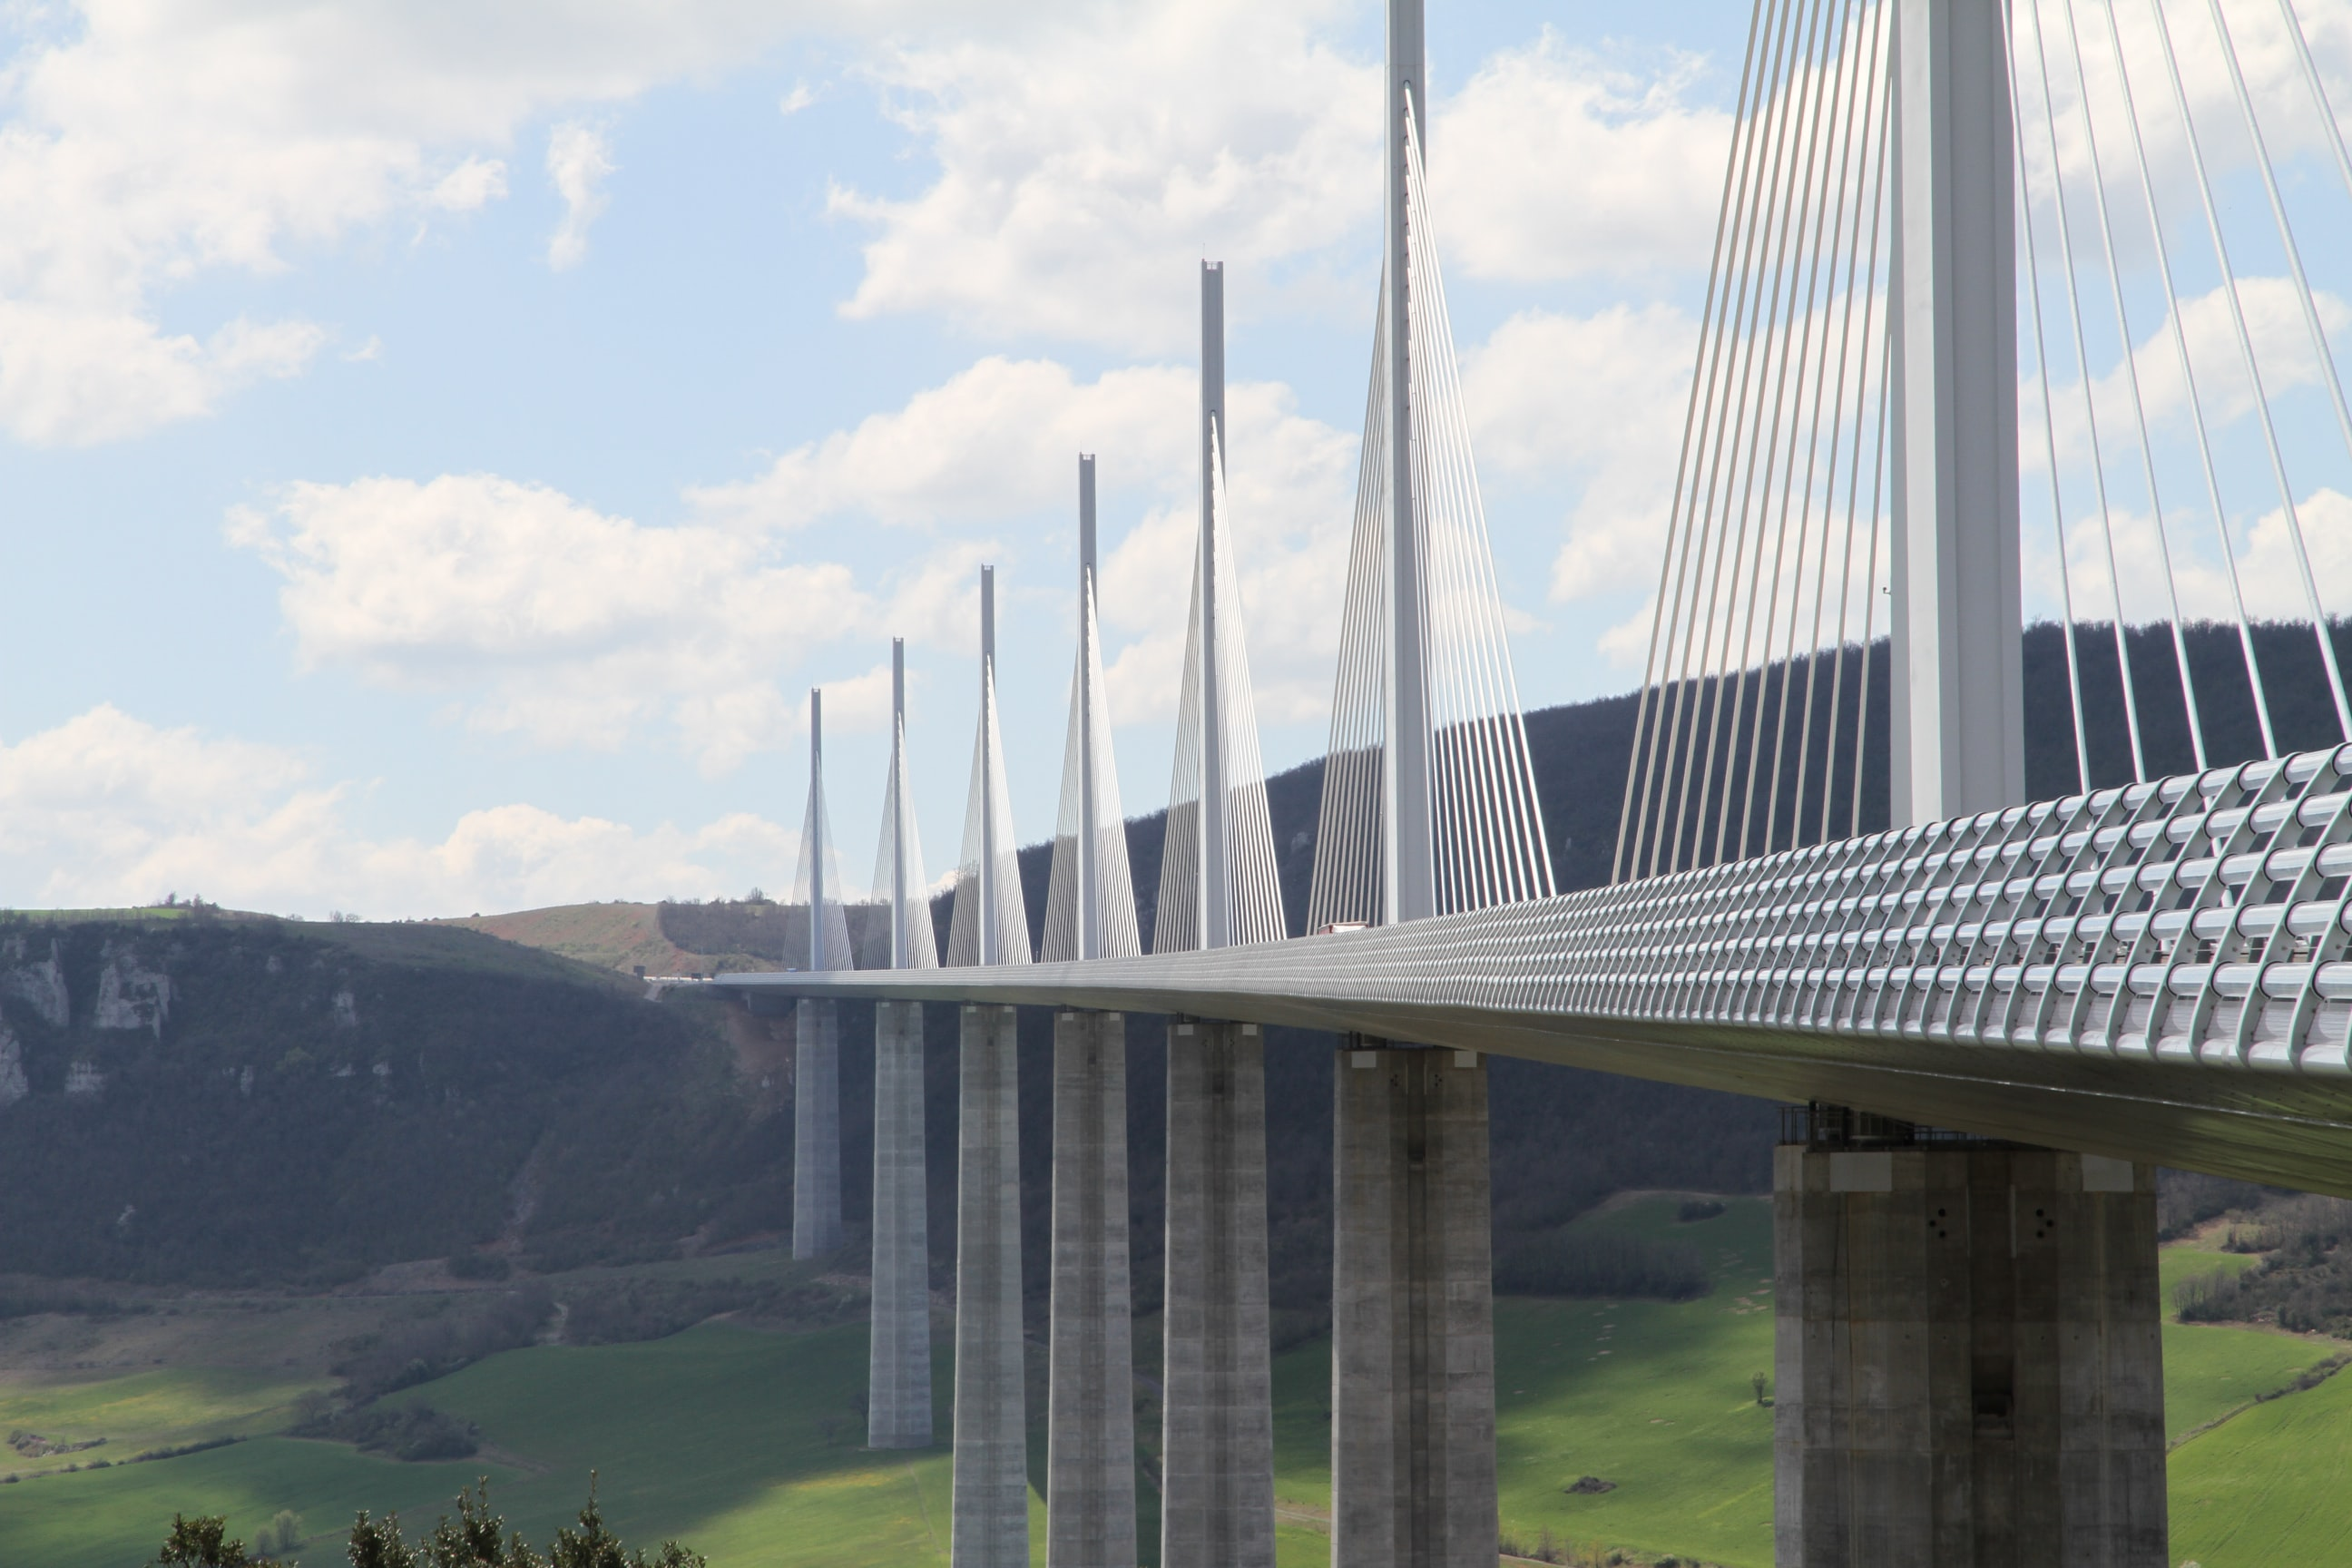 The Viaduc de Millau bridge and mountains against a blue sky